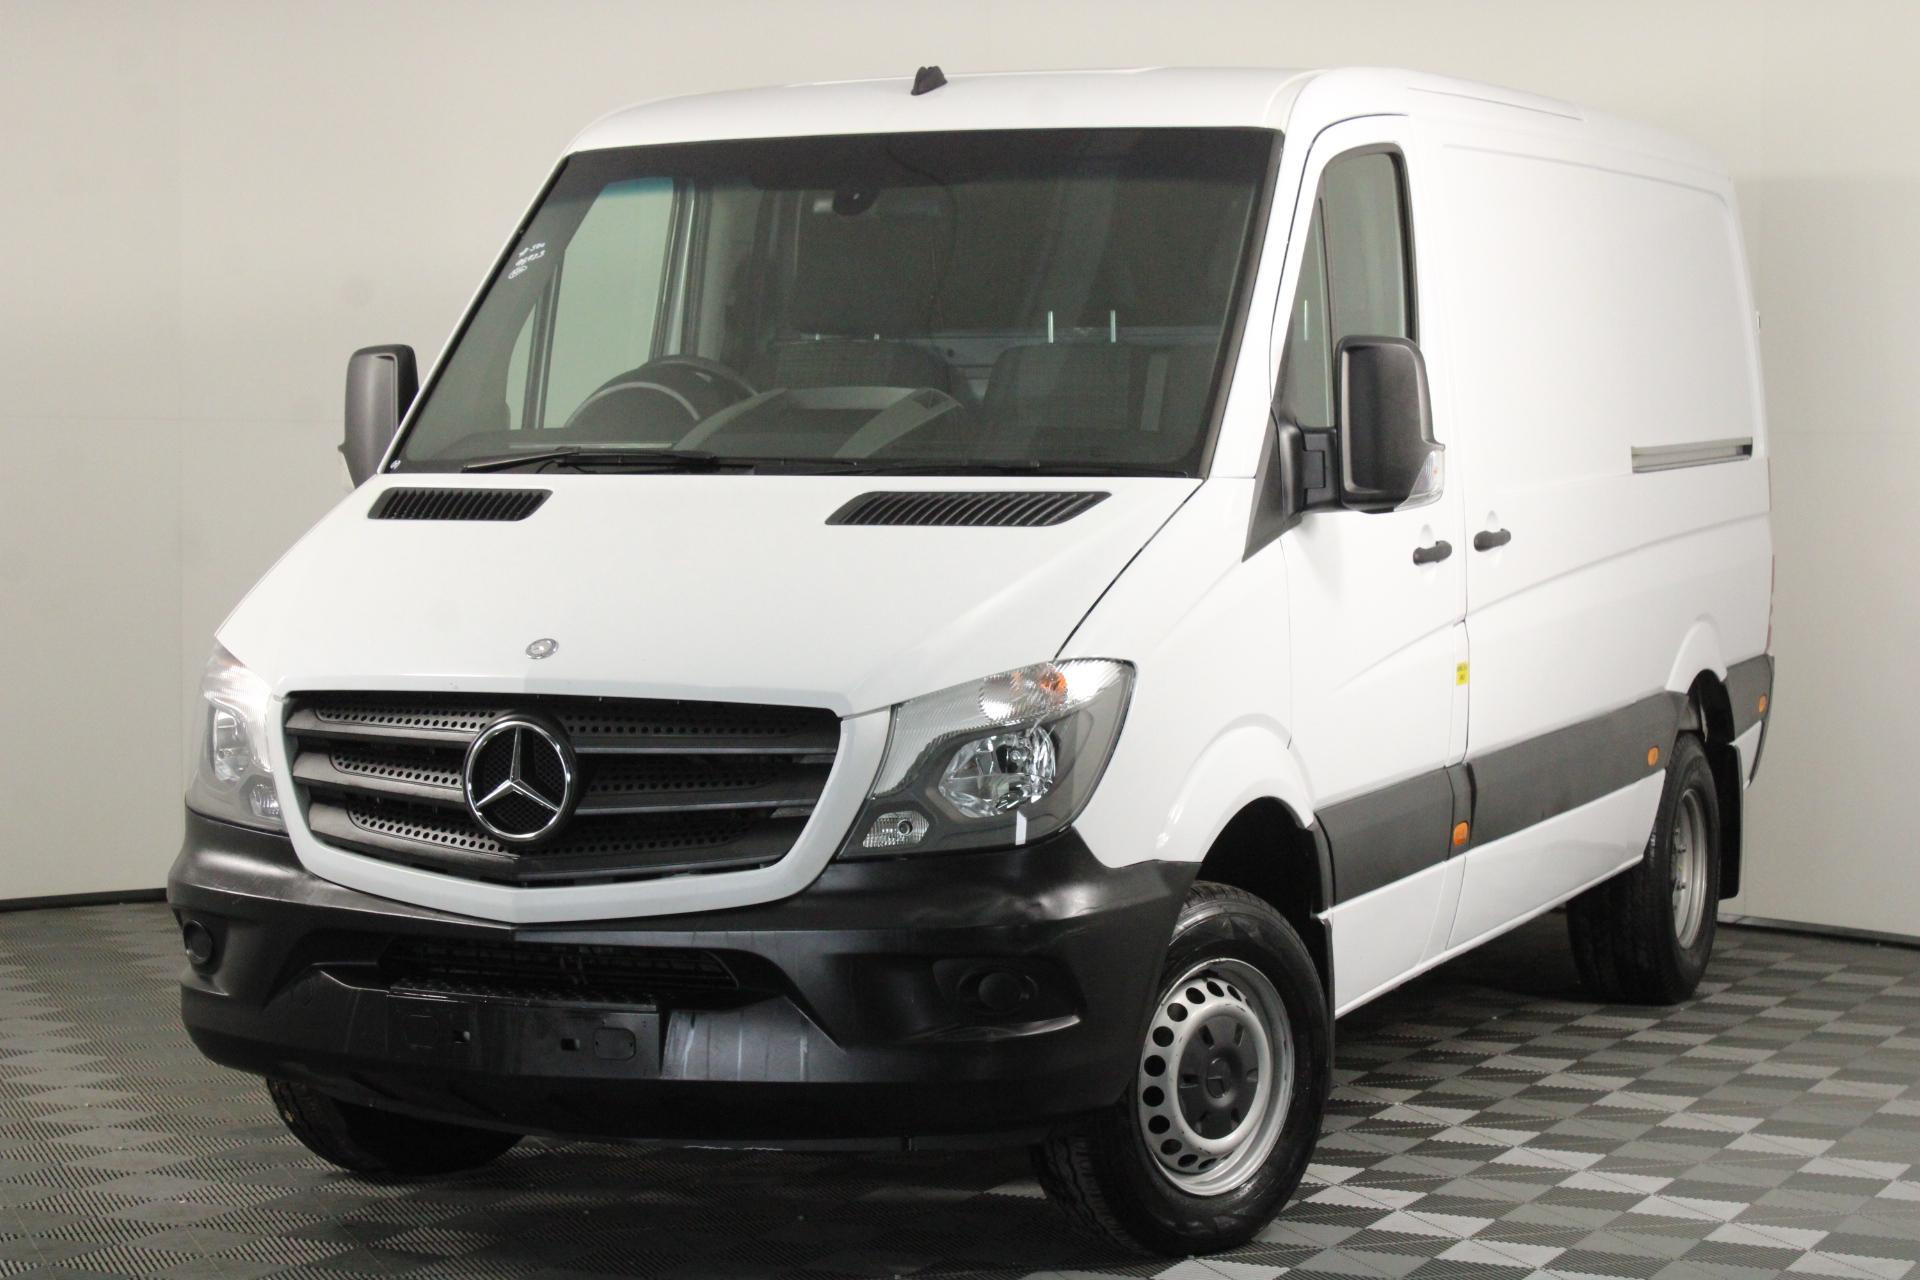 2014 Mercedes Benz Sprinter 416 CDI MWB Turbo Diesel Manual Van